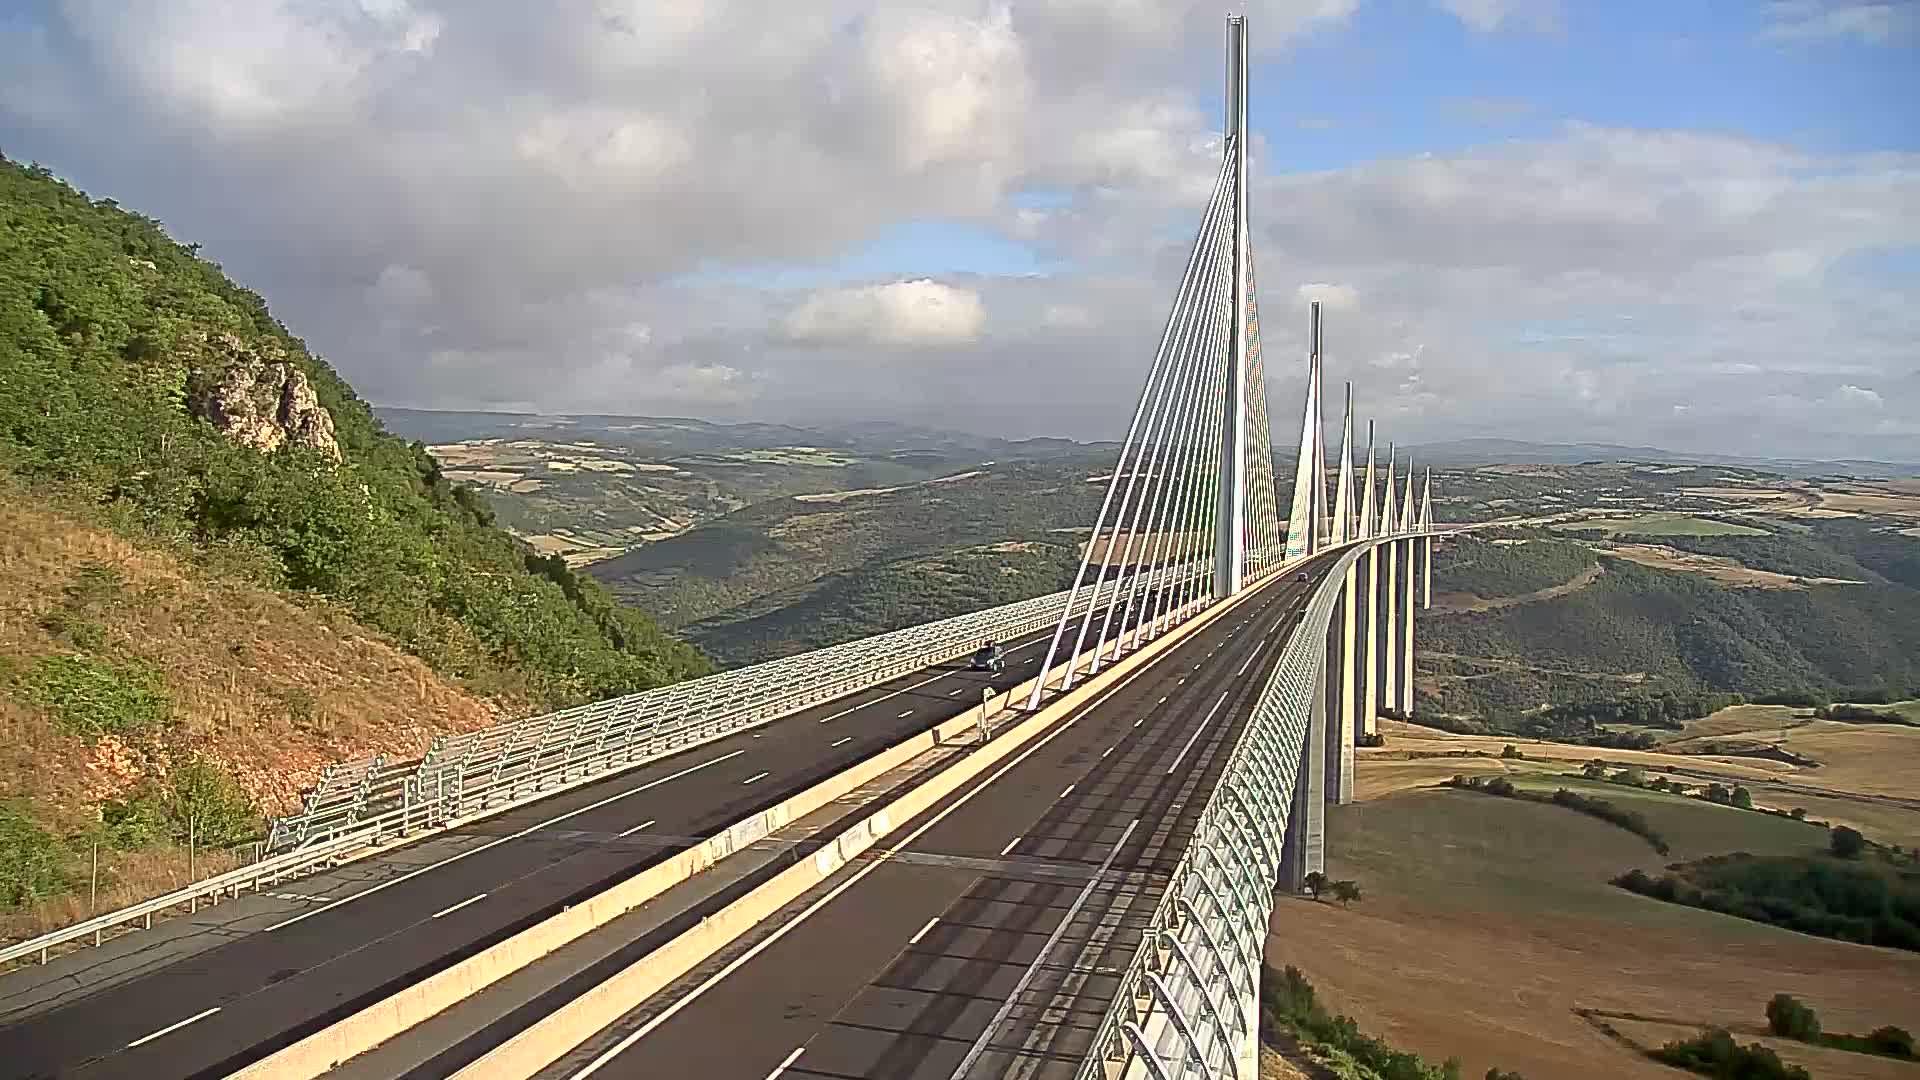 Millau Viaduct Wed. 08:47